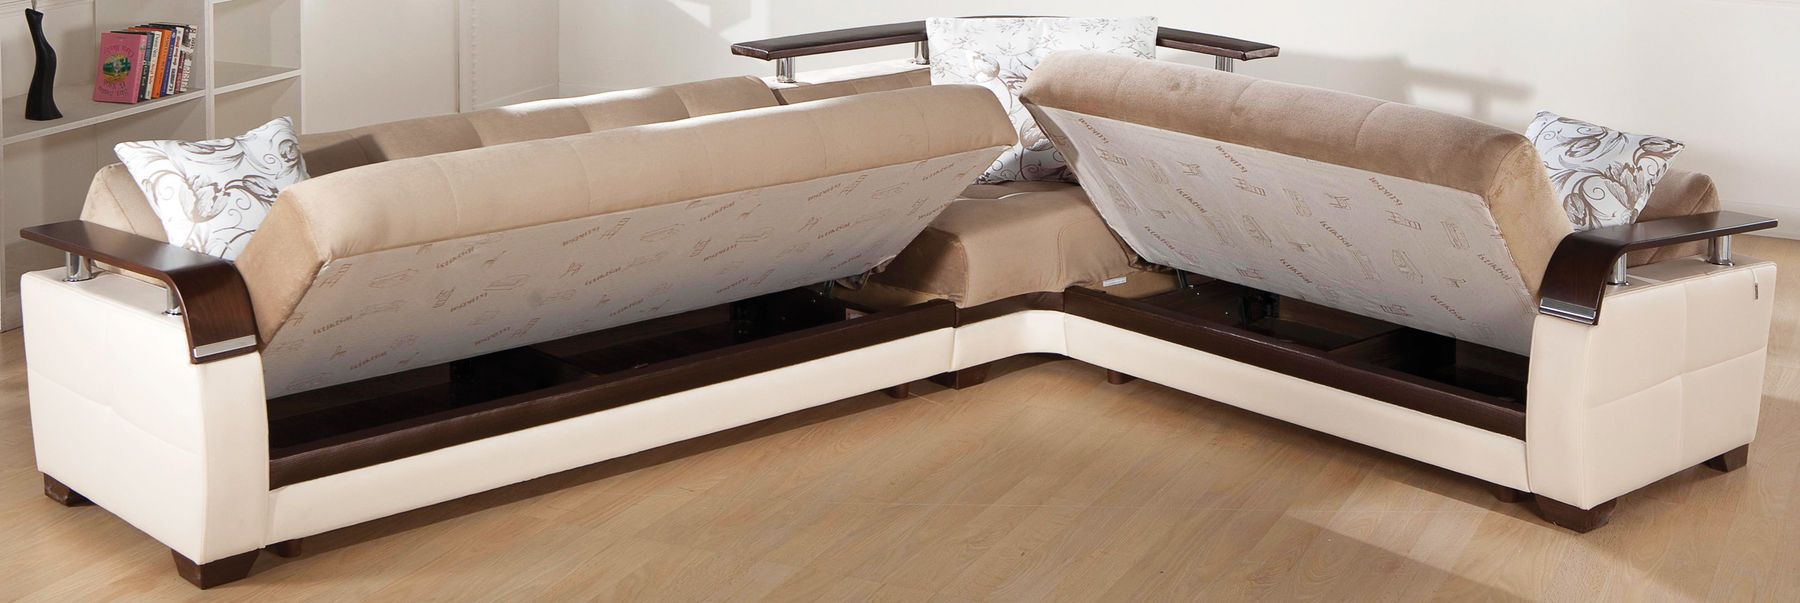 Natural Light Brown Sectional Sofa